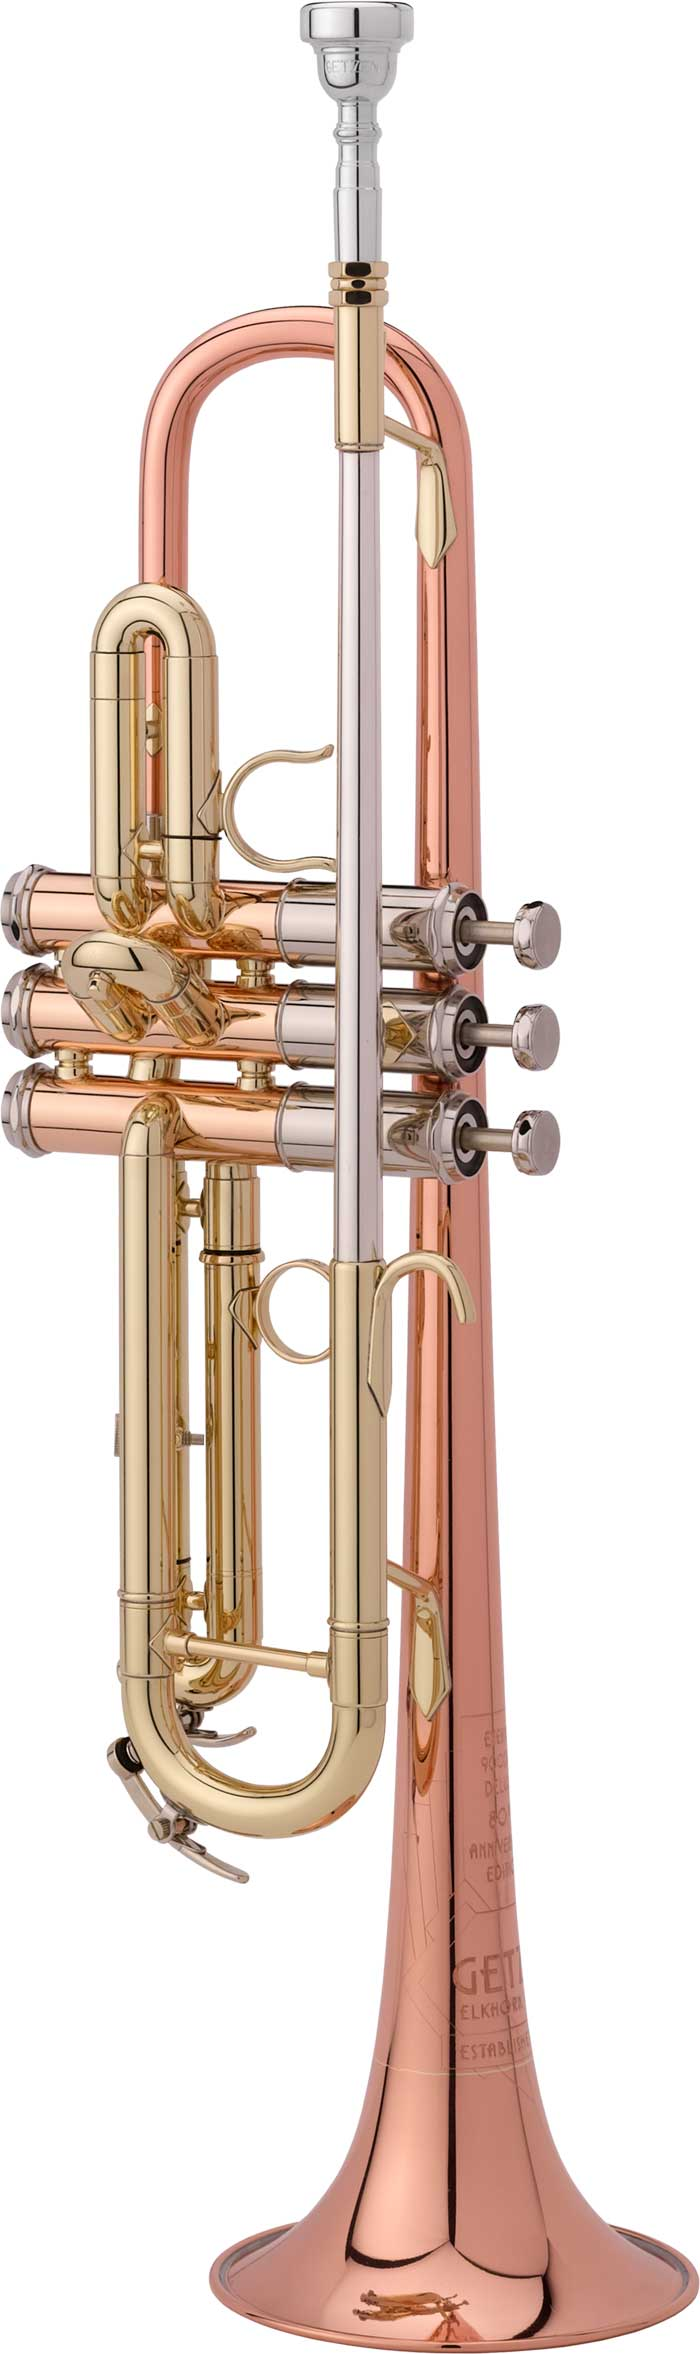 "900DLX Eterna ""Deluxe"" Bb Trumpet"